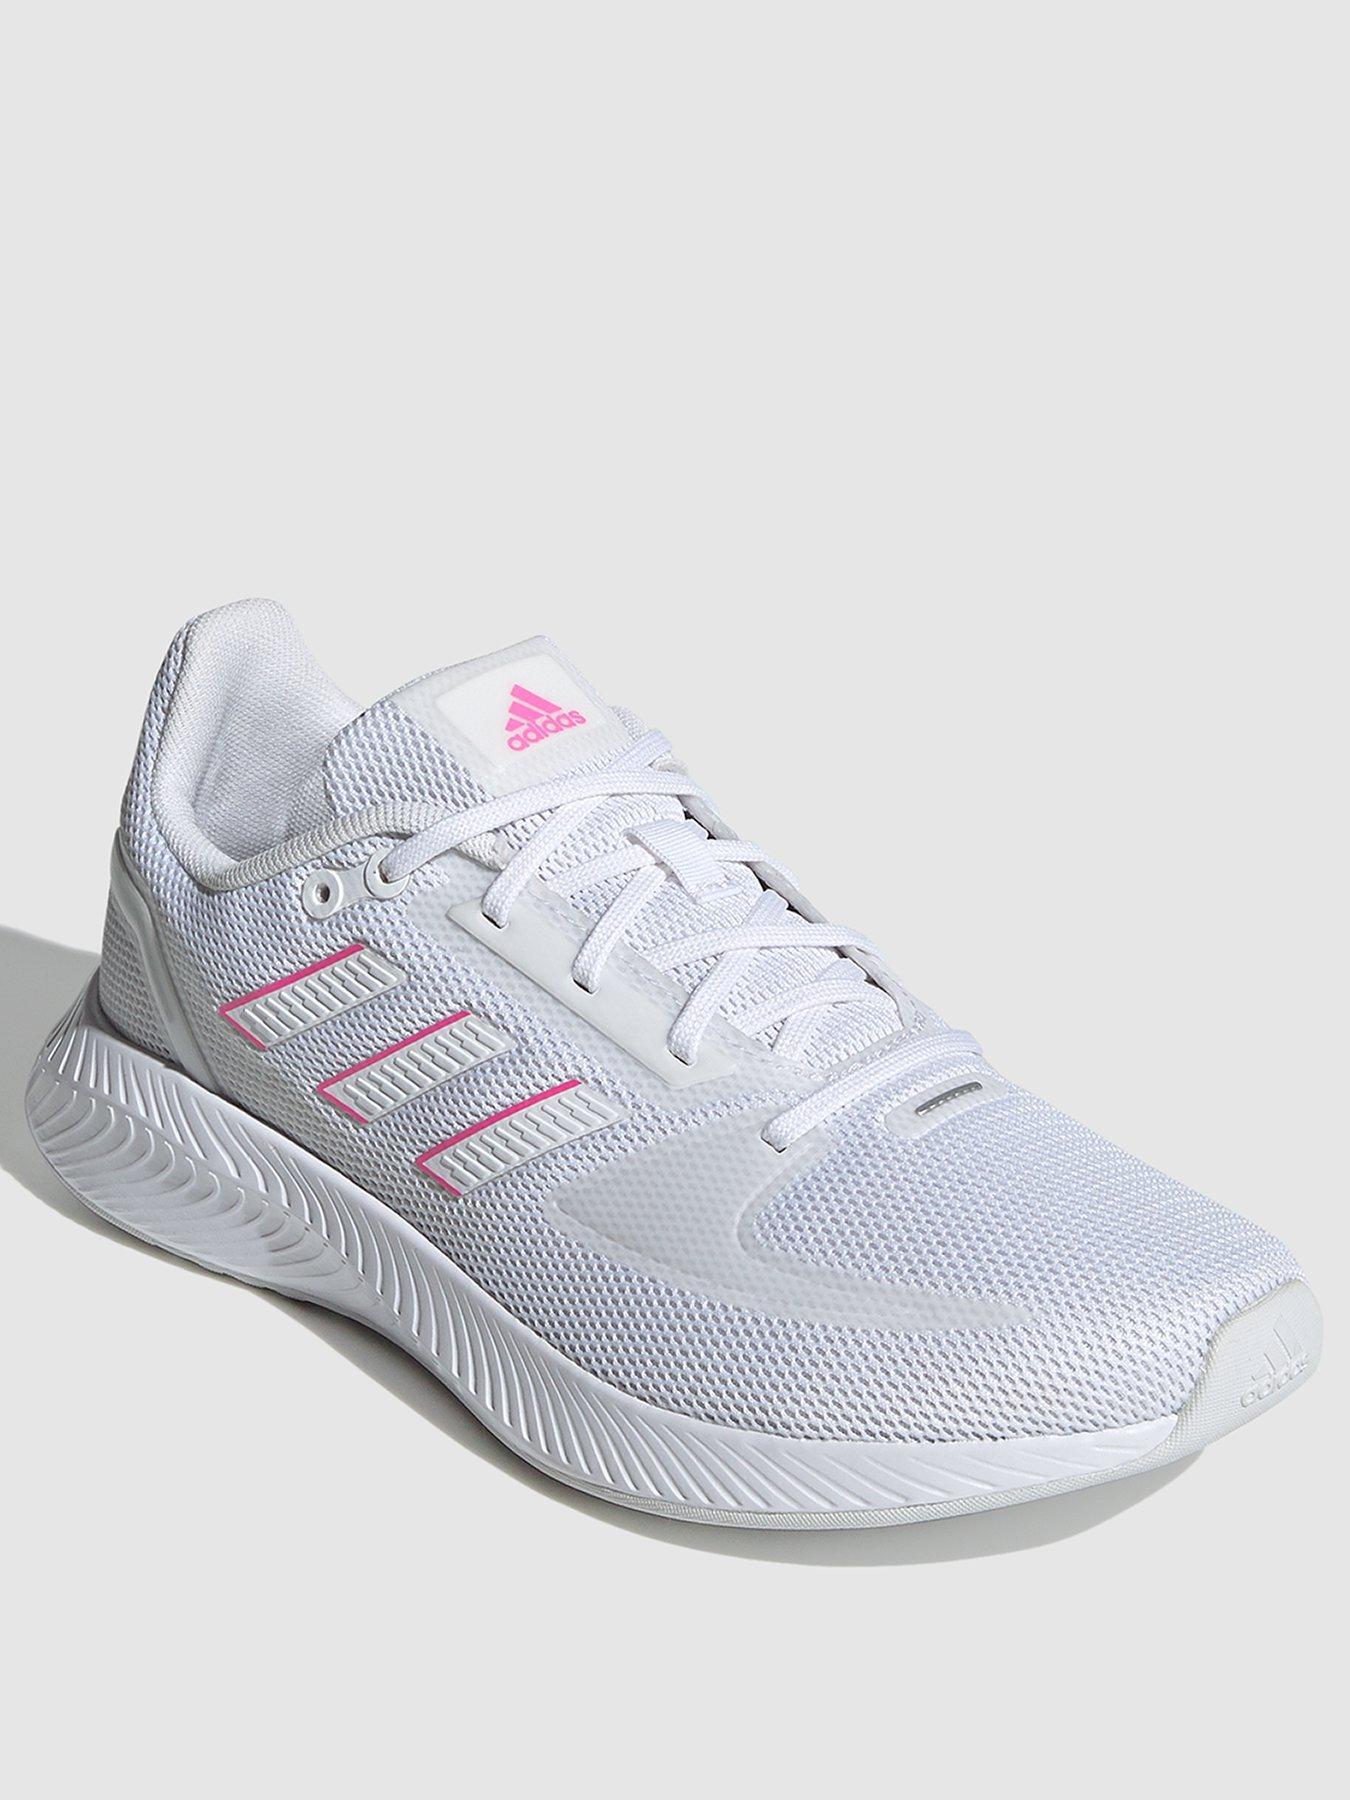 adidas womens trainers 5.5